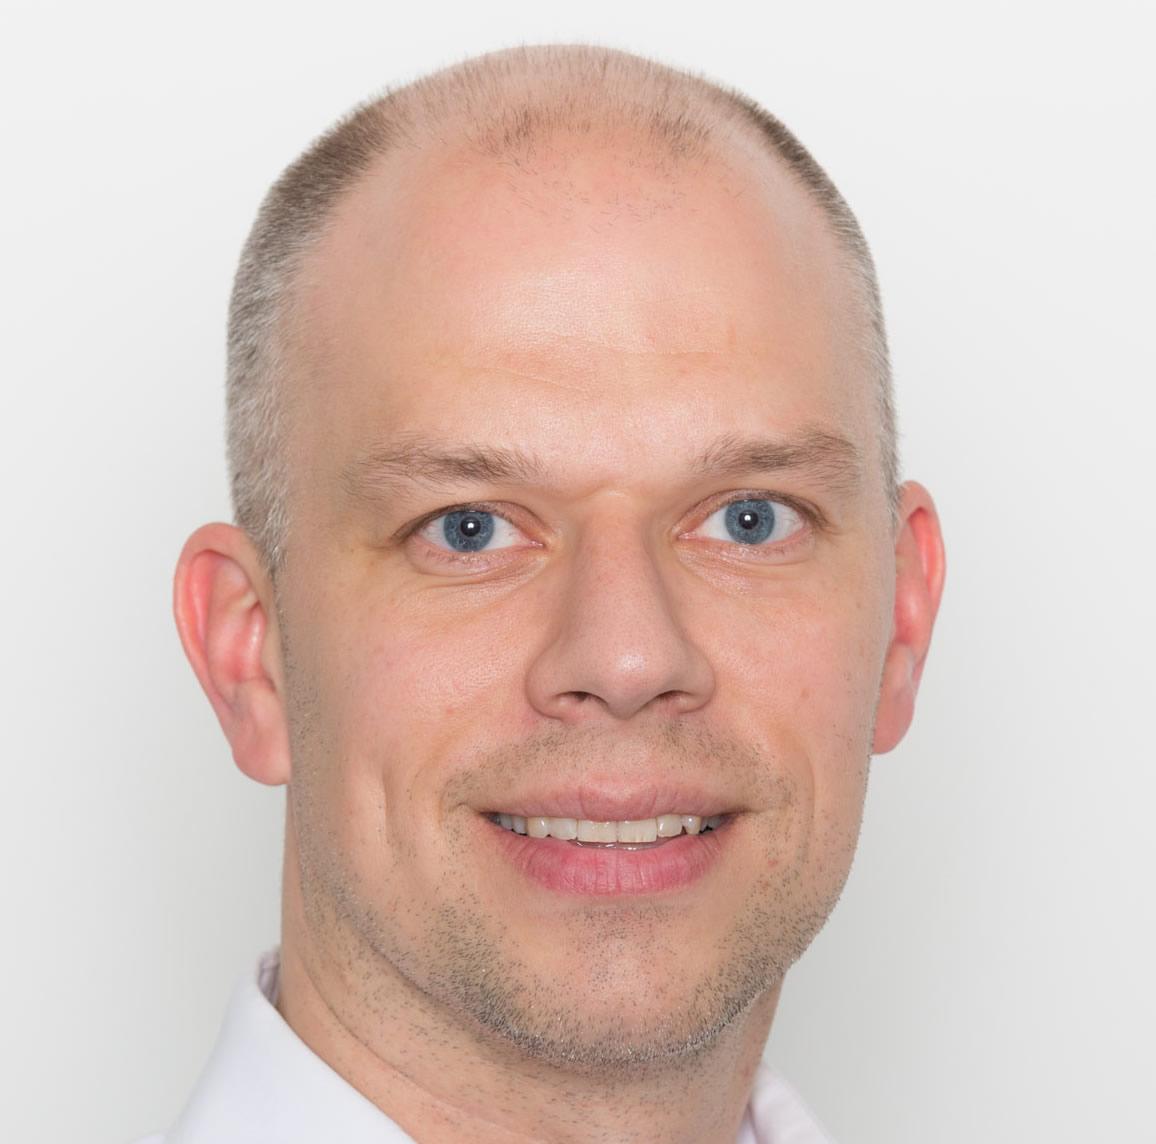 Dr. Felix Weise